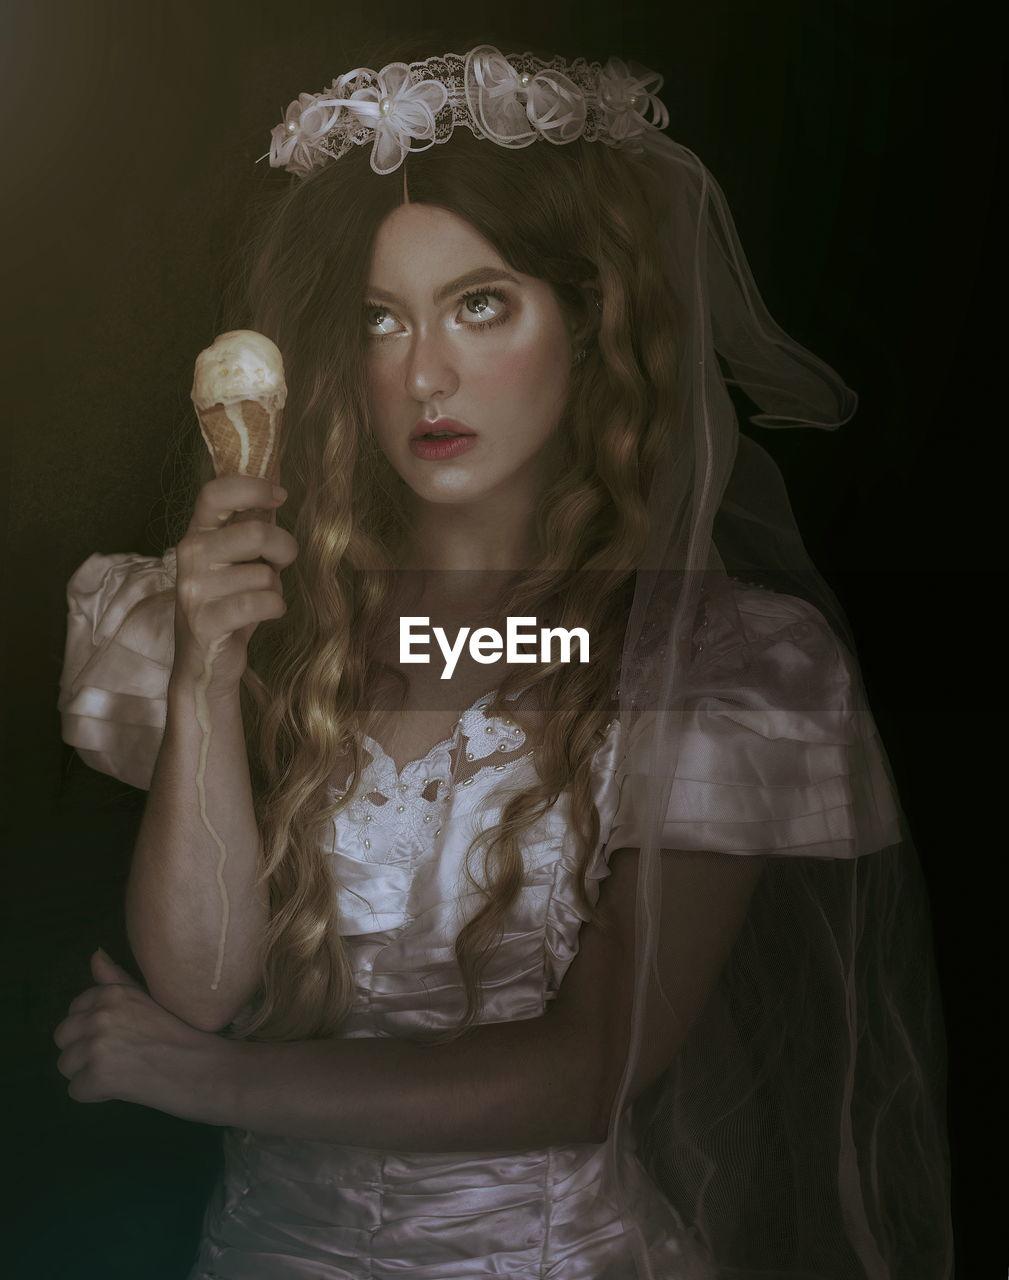 Thoughtful female model in costume having ice cream cone against black background